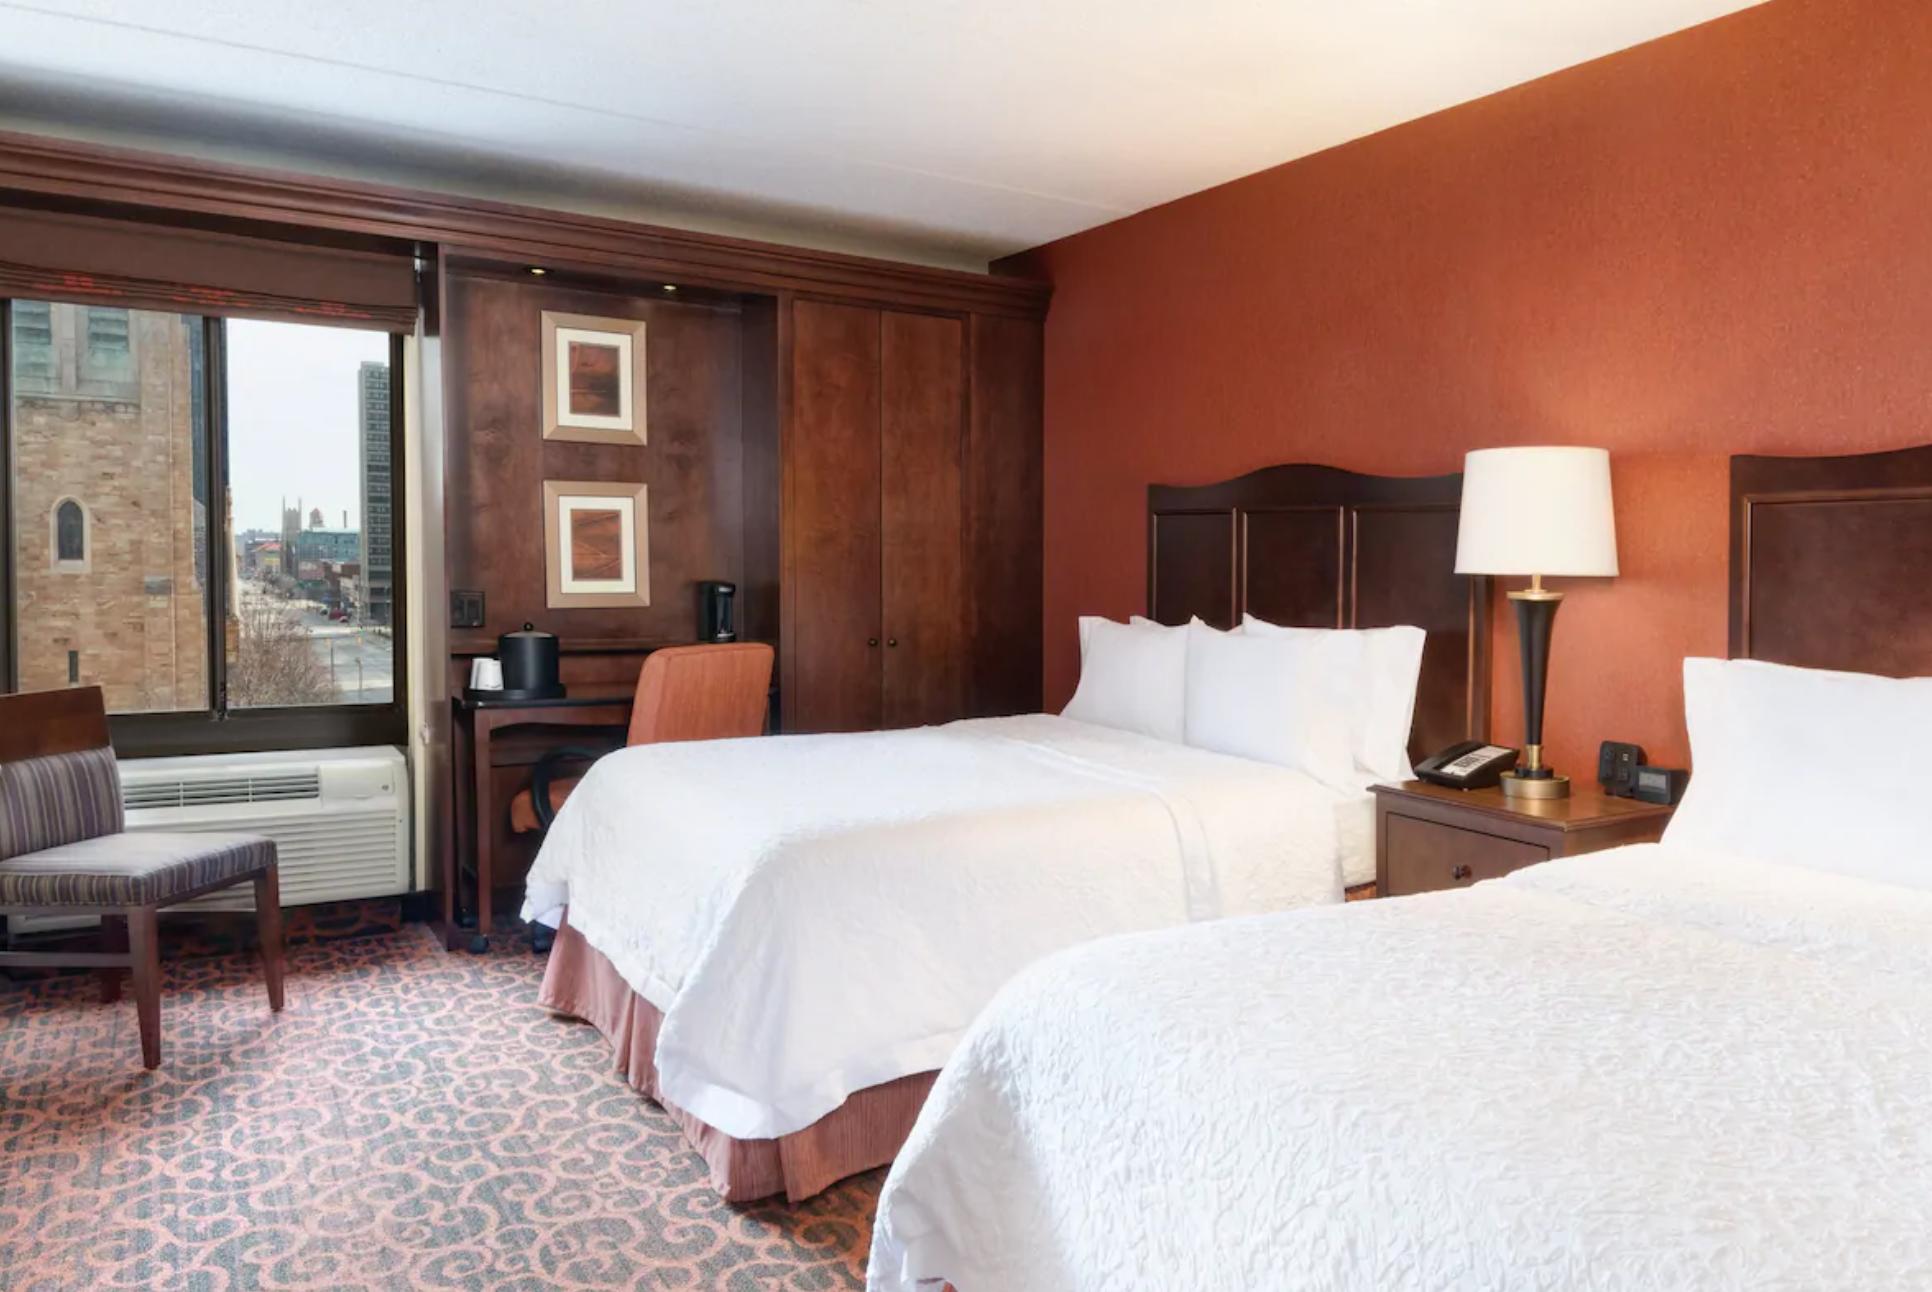 https://www.hotelsbyday.com/_data/default-hotel_image/3/18854/screenshot-2020-06-15-at-1-12-10-pm.png